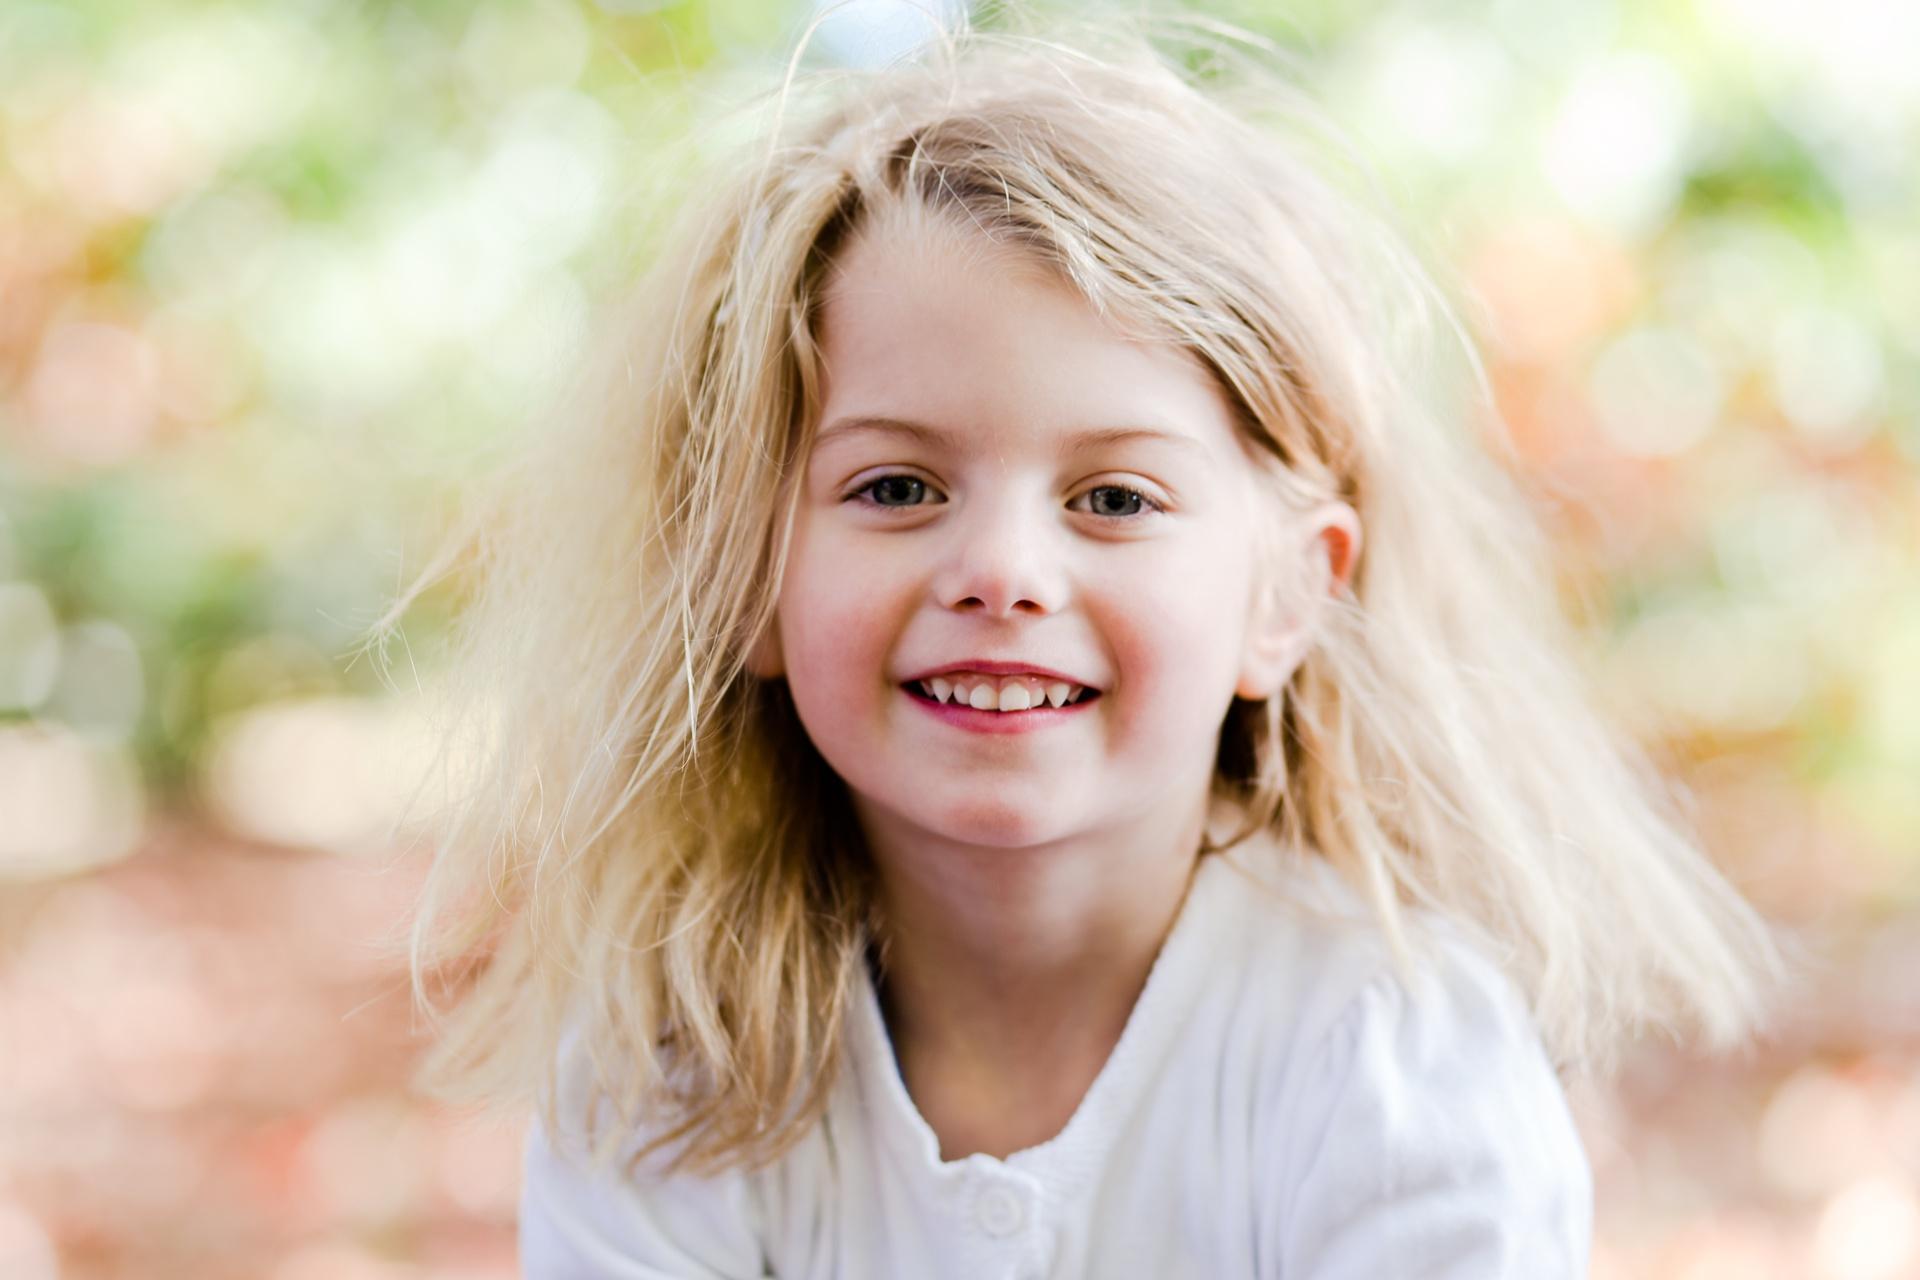 Cute girl in park photo shoot